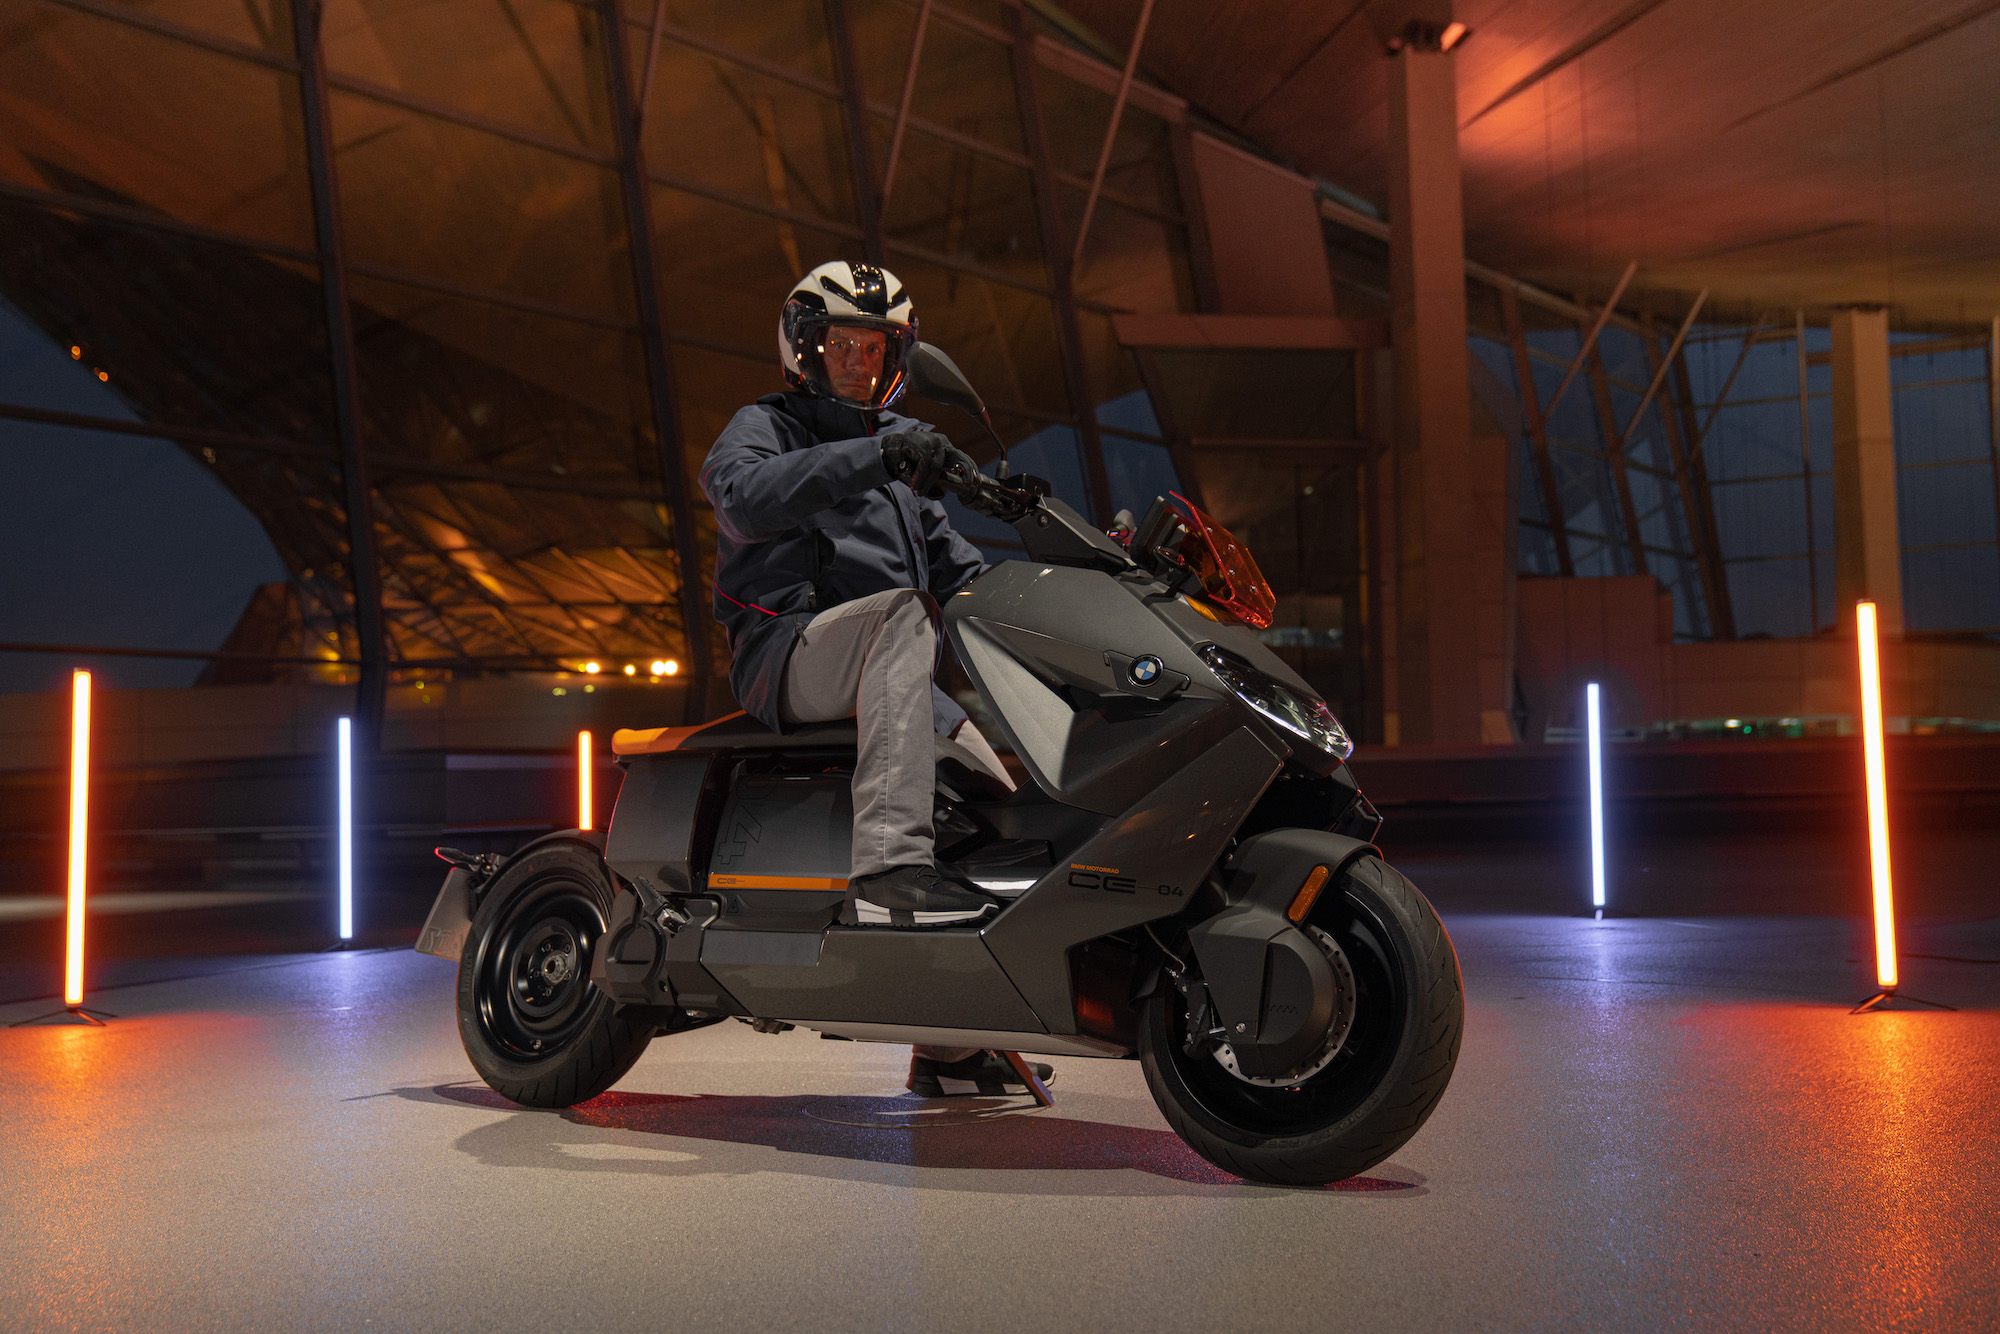 2022 BMW CE 04 scooter